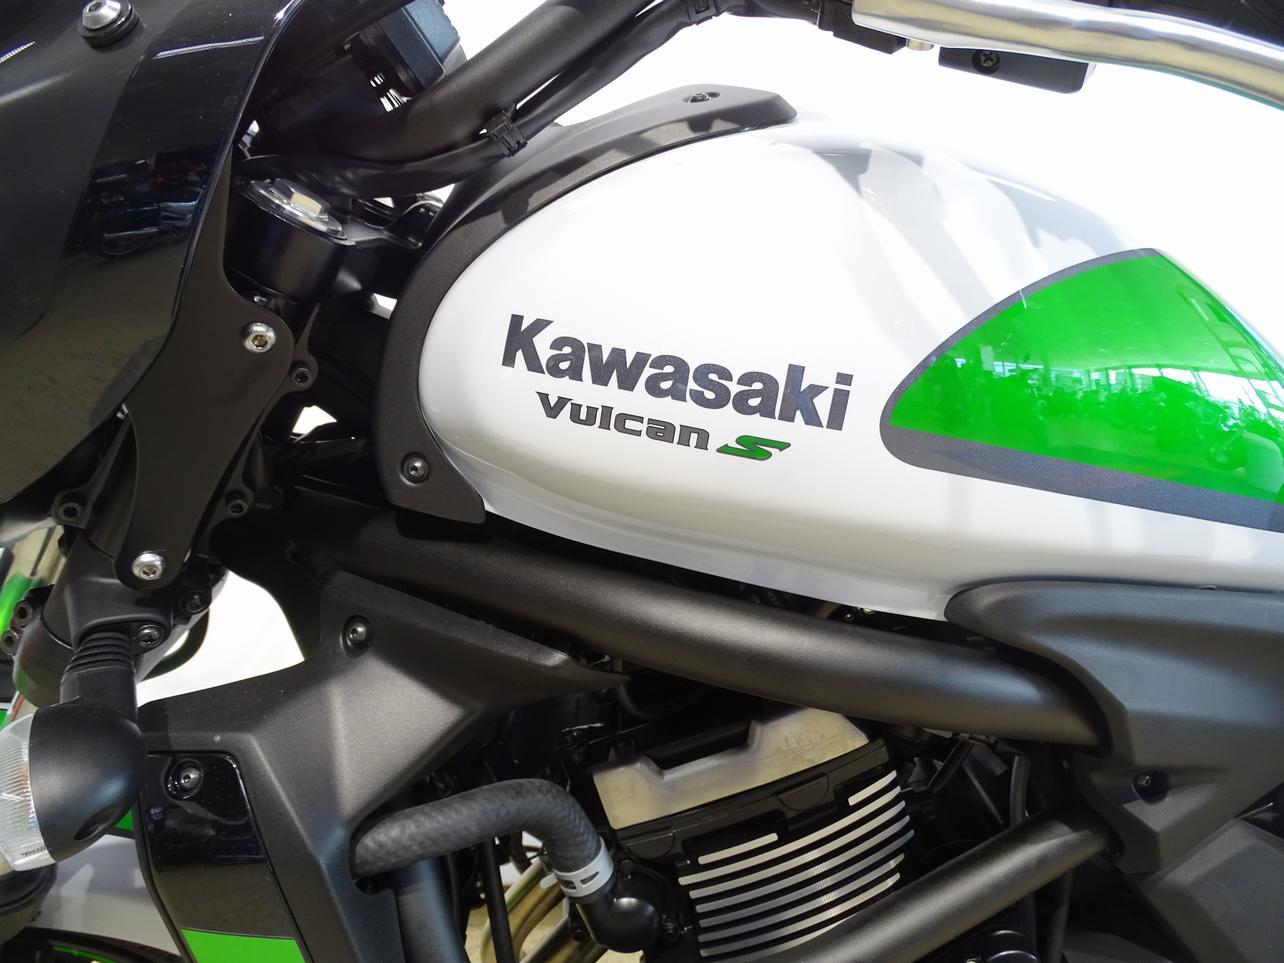 KAWASAKI - Vulcan650 S-ABS Cafe Edition